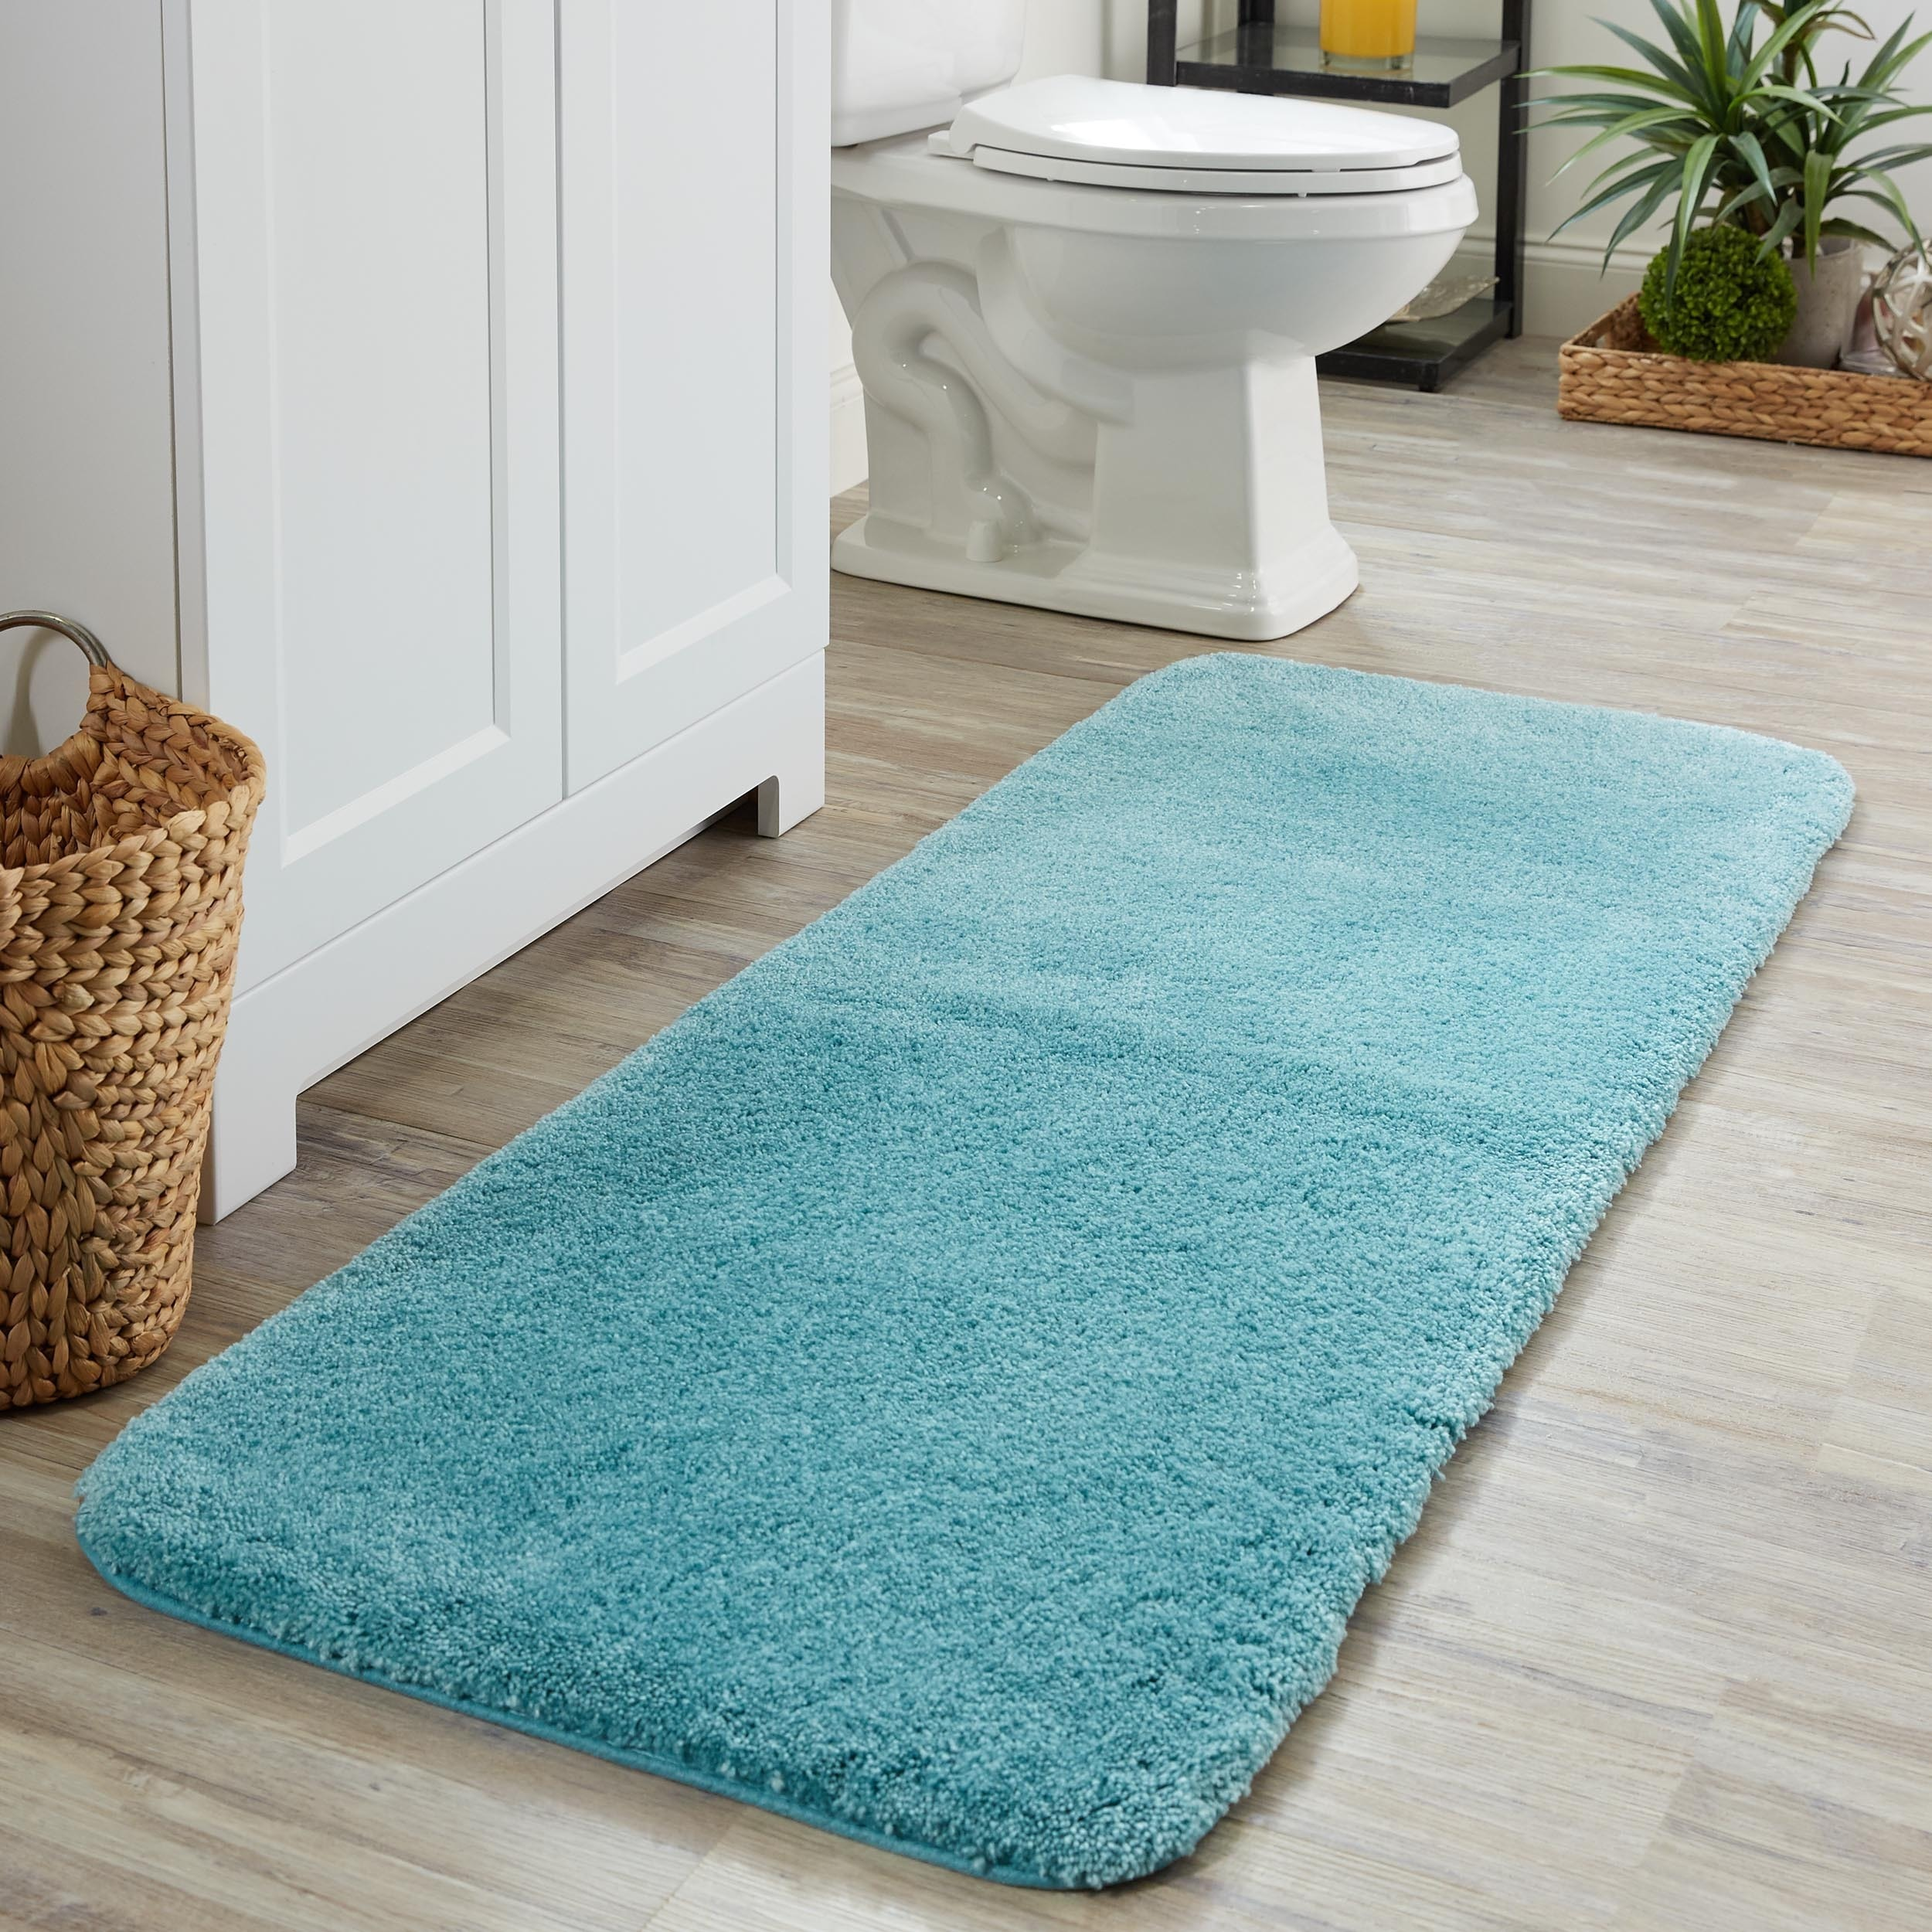 Mohawk Home Spa Bath Rug ...